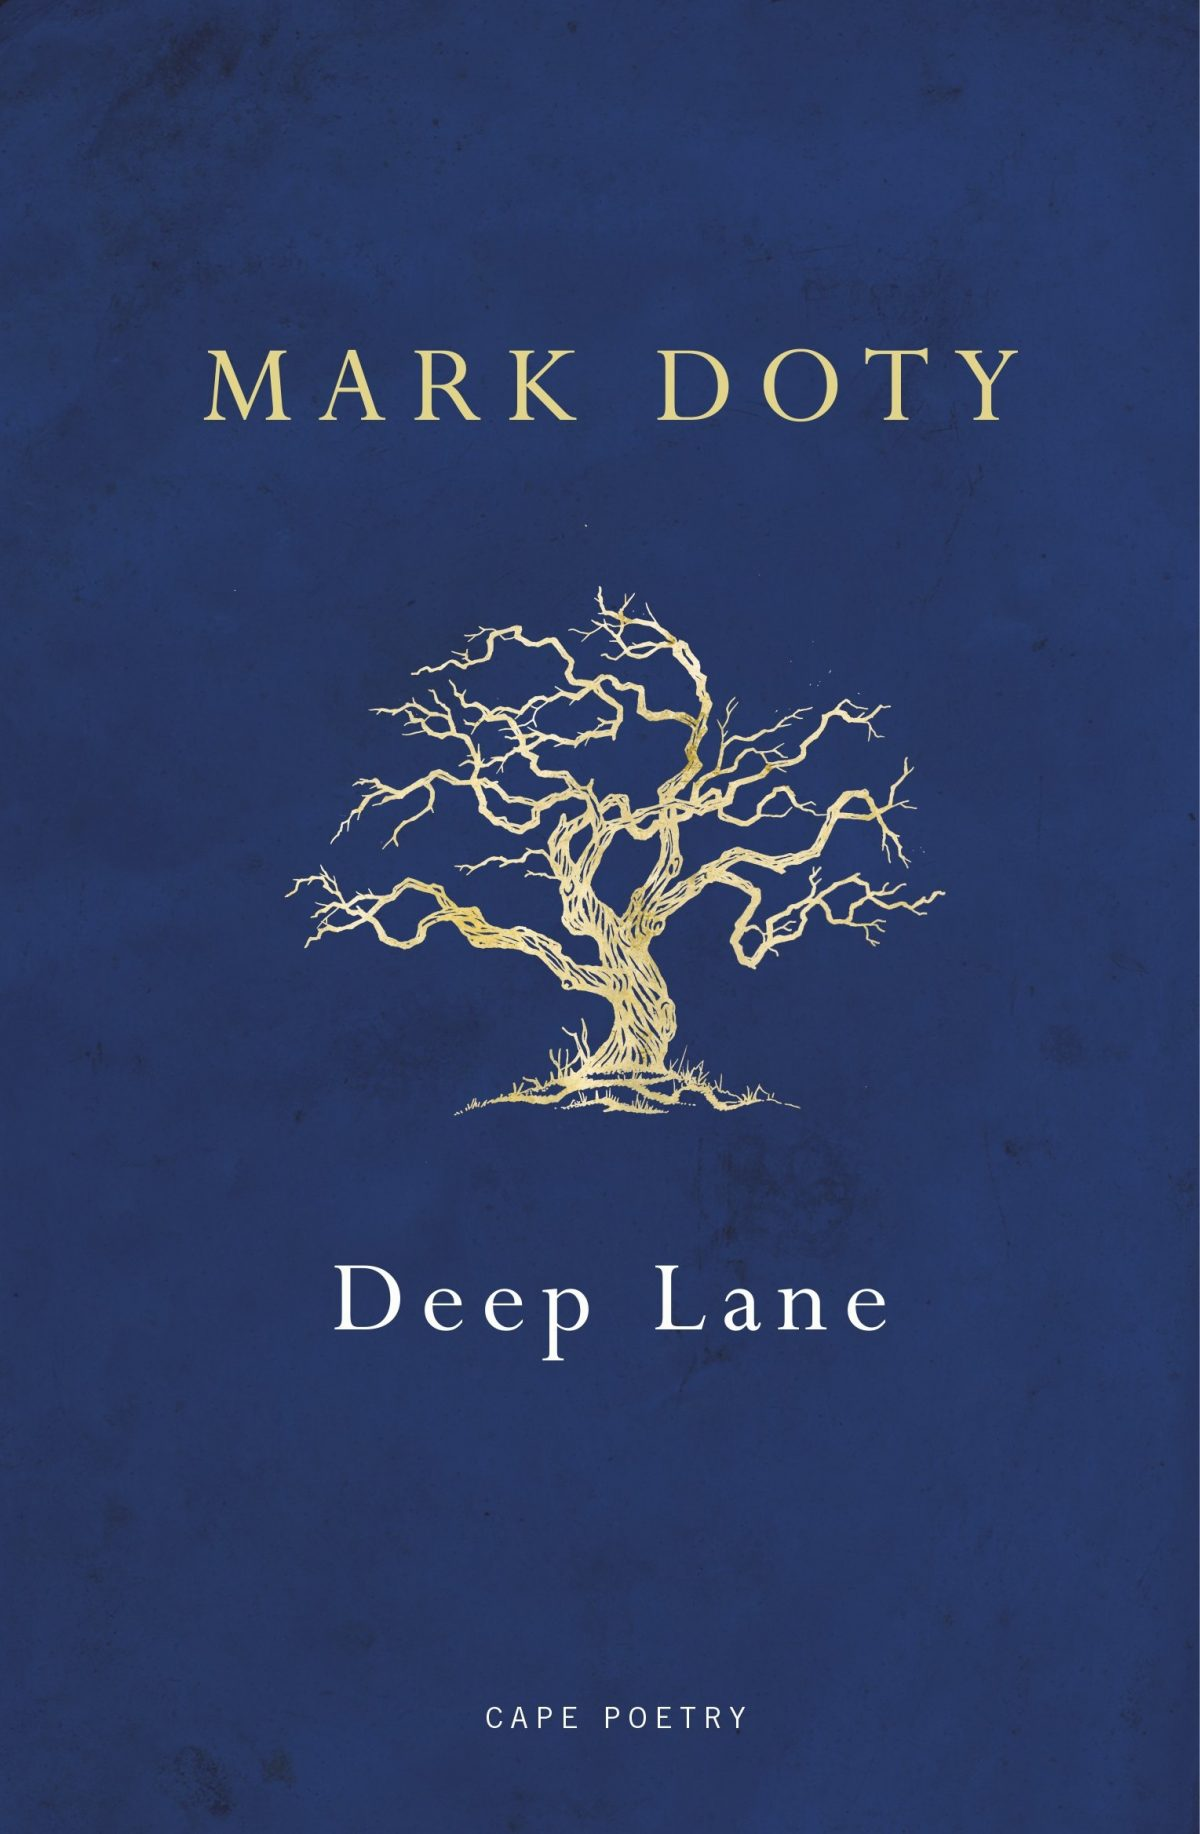 From My Poetry Bookshelf – Mark Doty